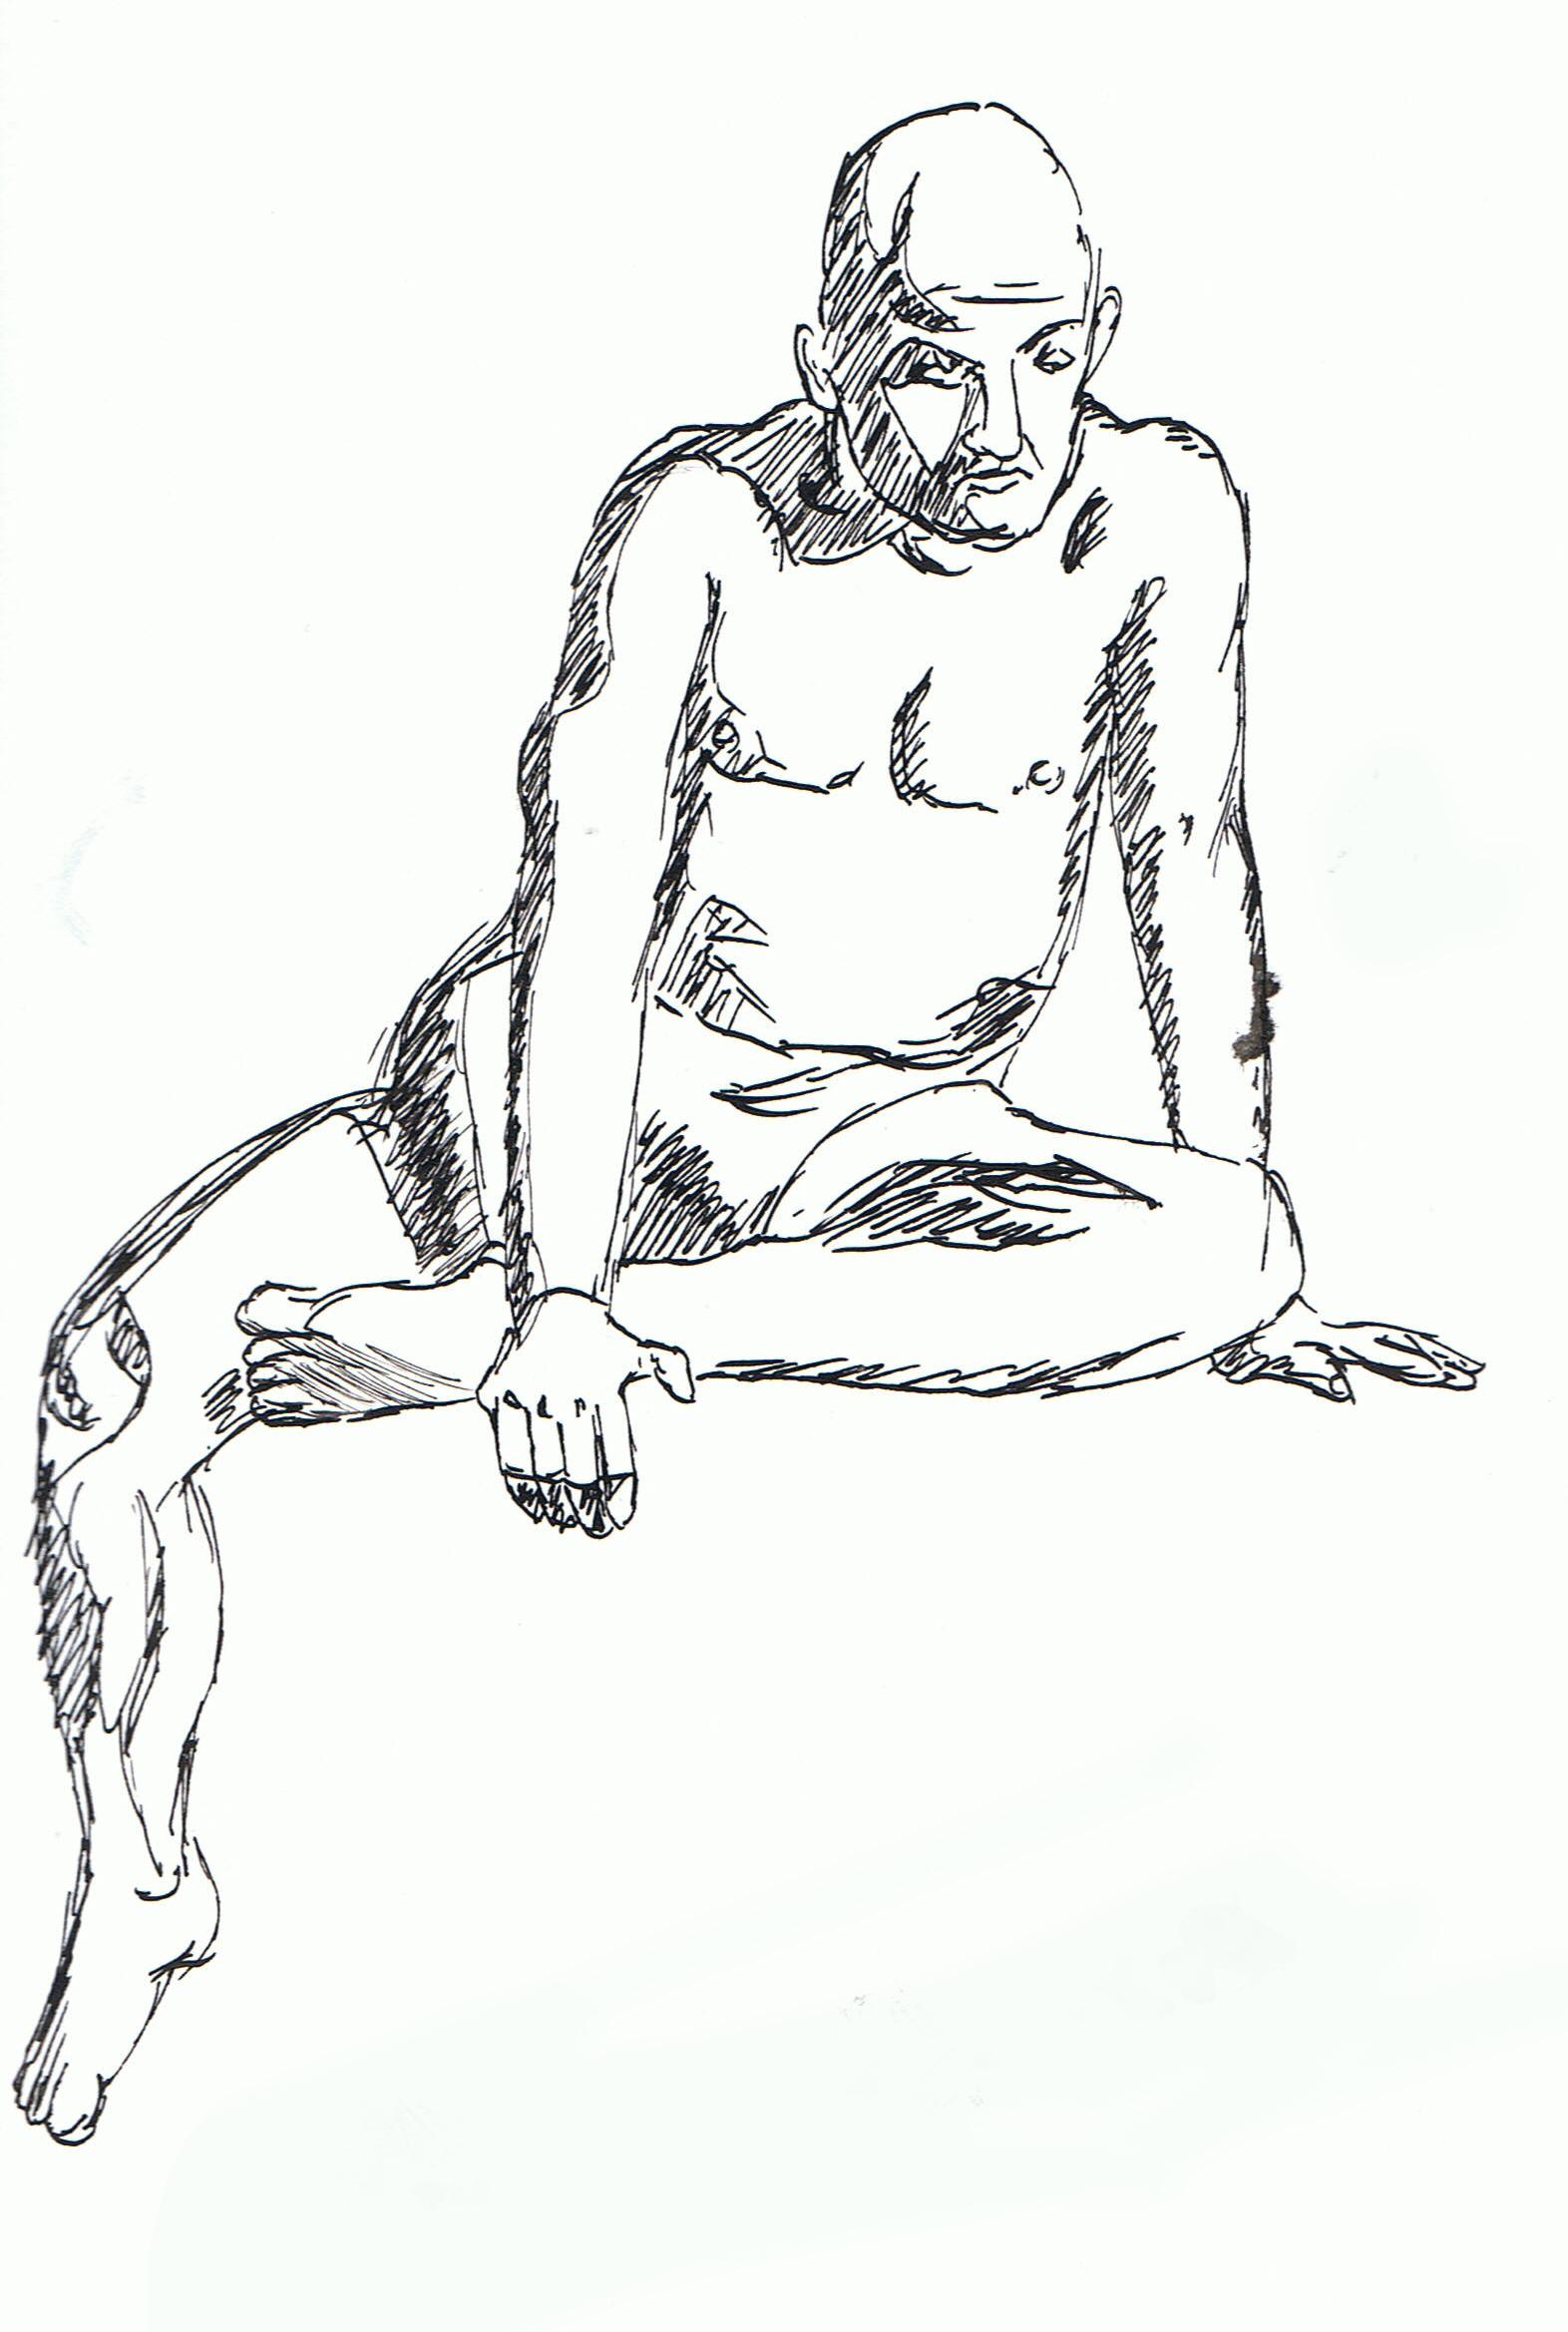 Model sketch # 1